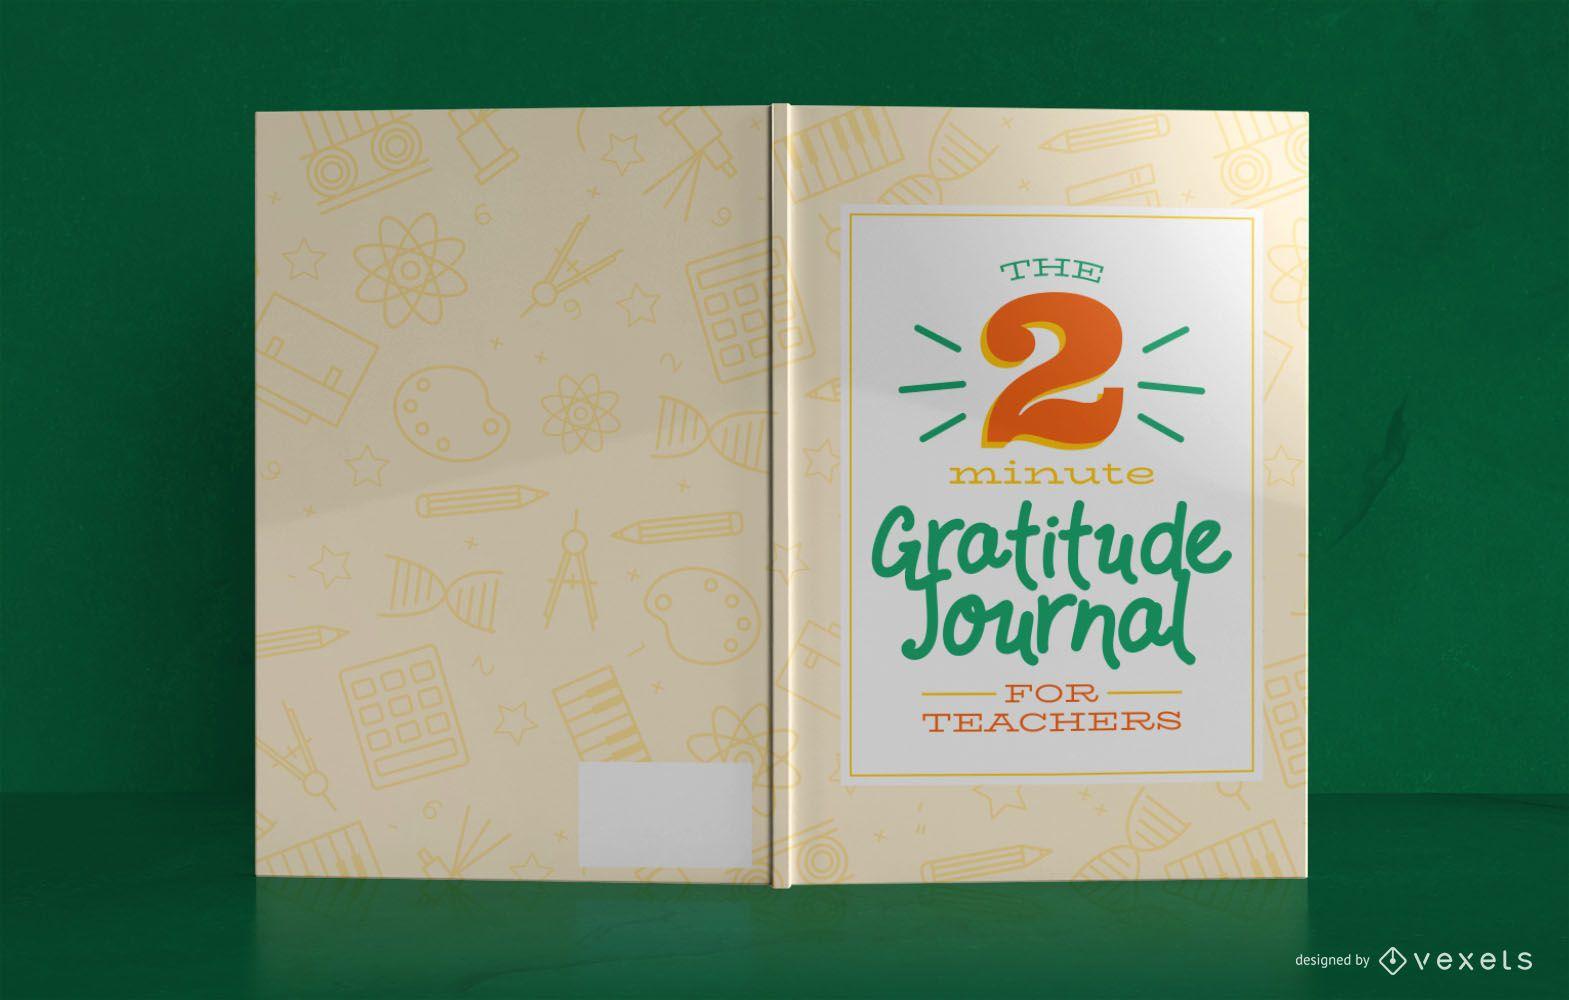 Teacher Gratitude journal book cover design